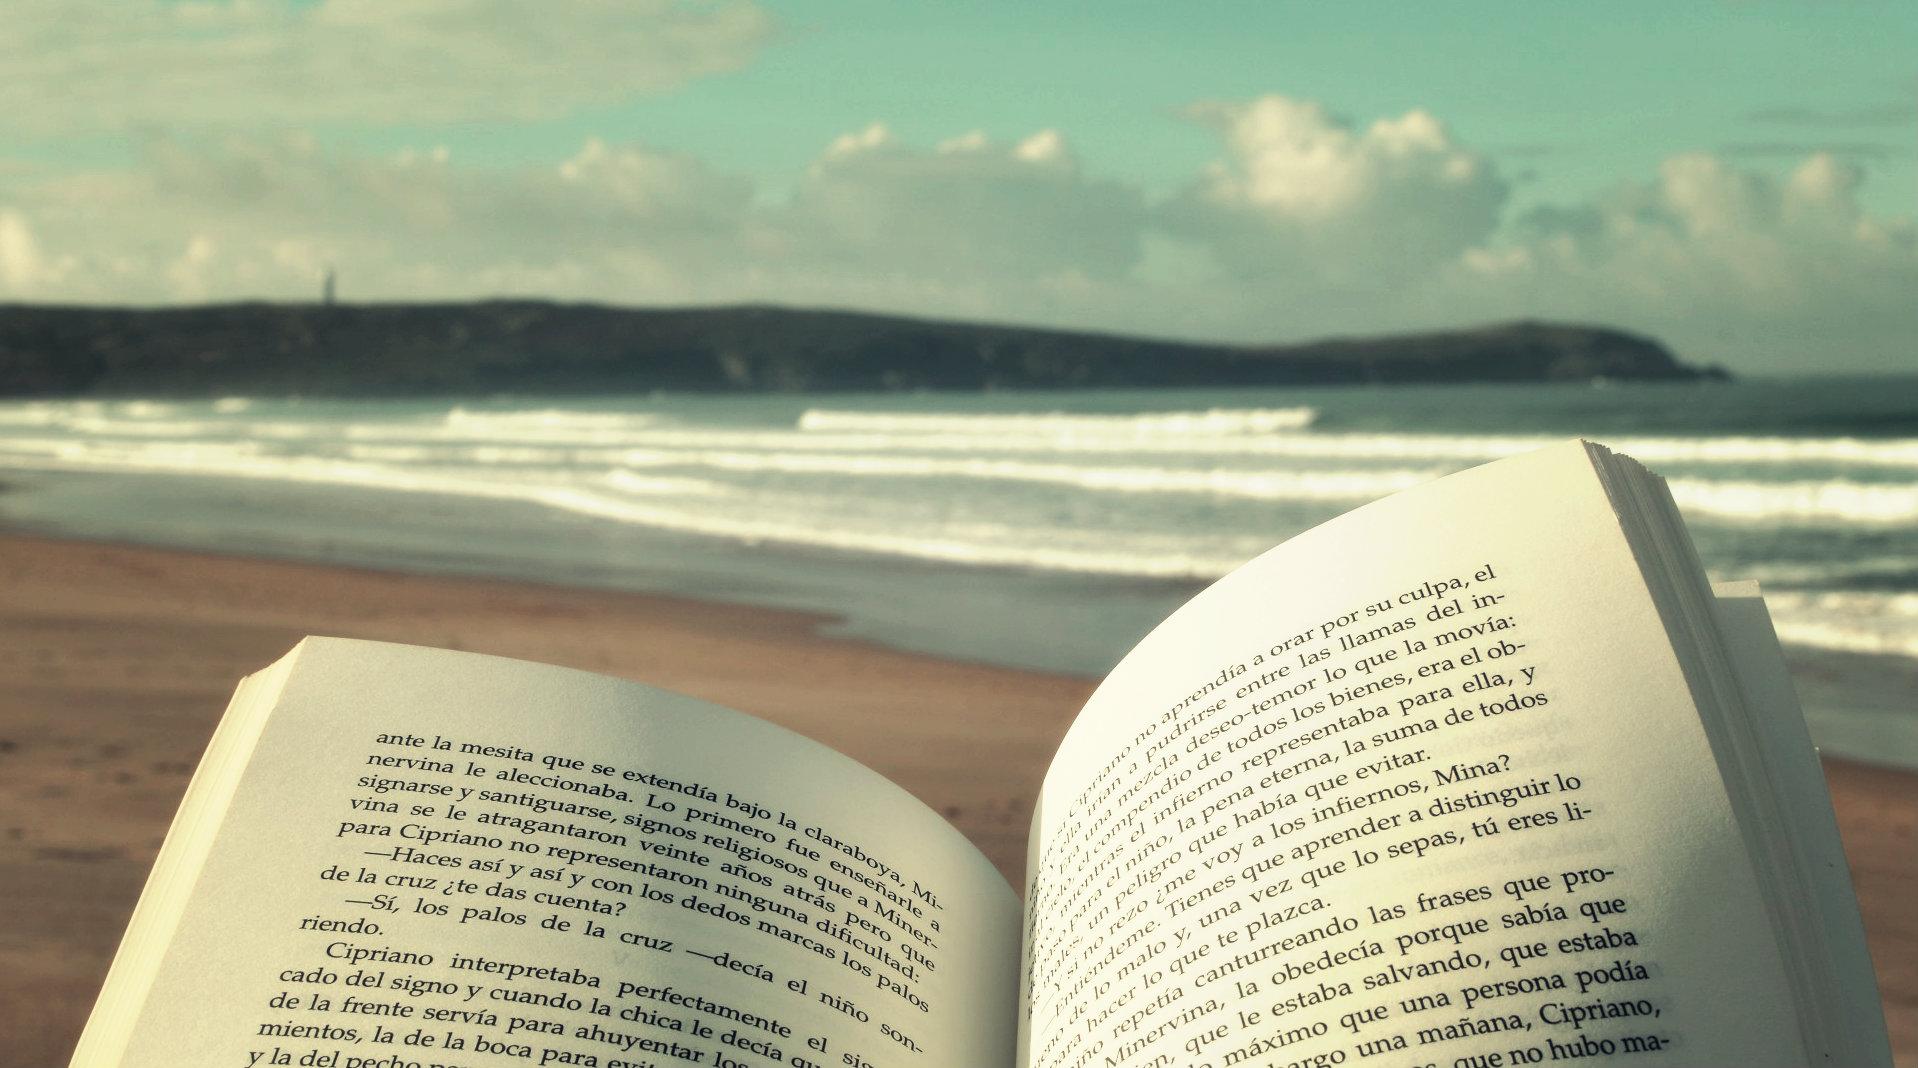 Libri per l 39 estate archivi pensieri accesi pensieri accesi for Libri da leggere